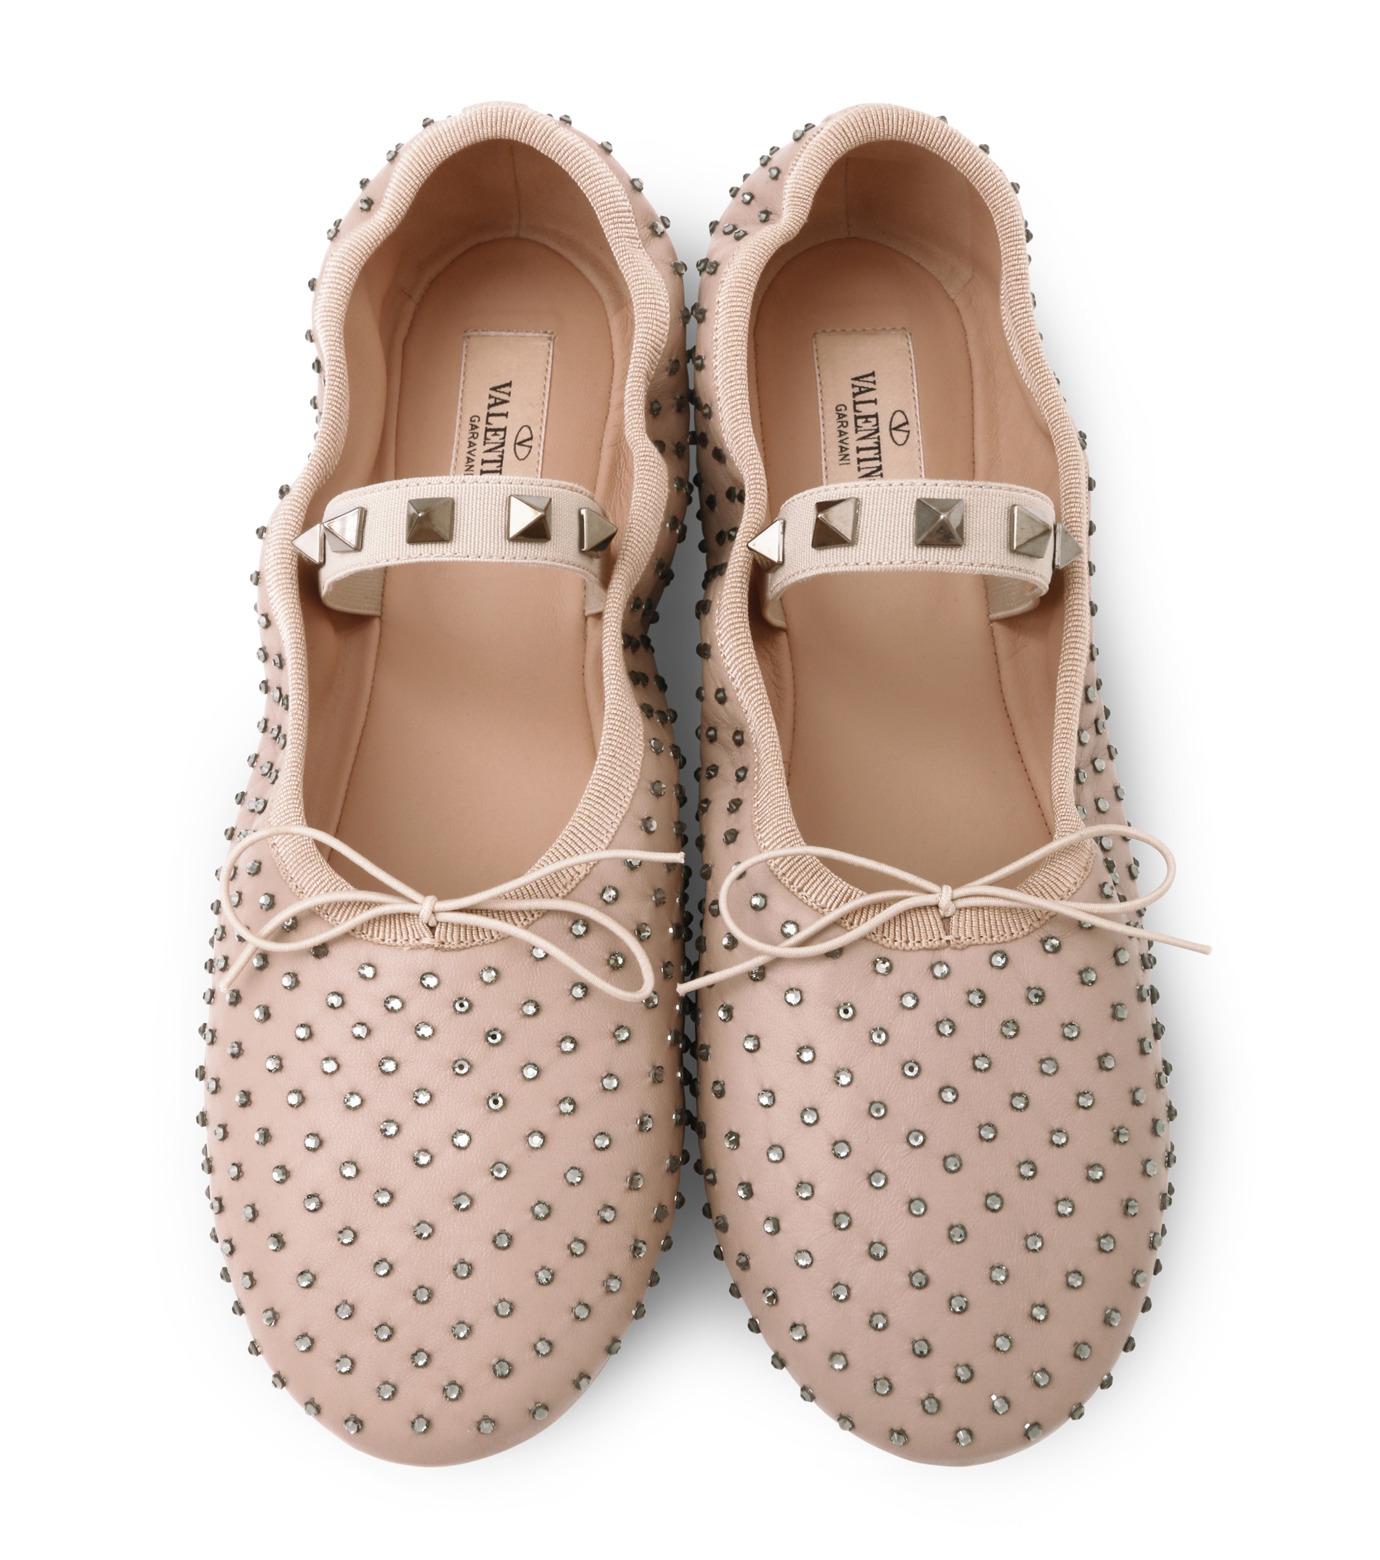 VALENTINO GARAVANI(ヴァレンティノ ガラヴァーニ)のBallerina Flat Strass-BEIGE(フラットシューズ/Flat shoes)-LW0S0A93FNR-52 拡大詳細画像4